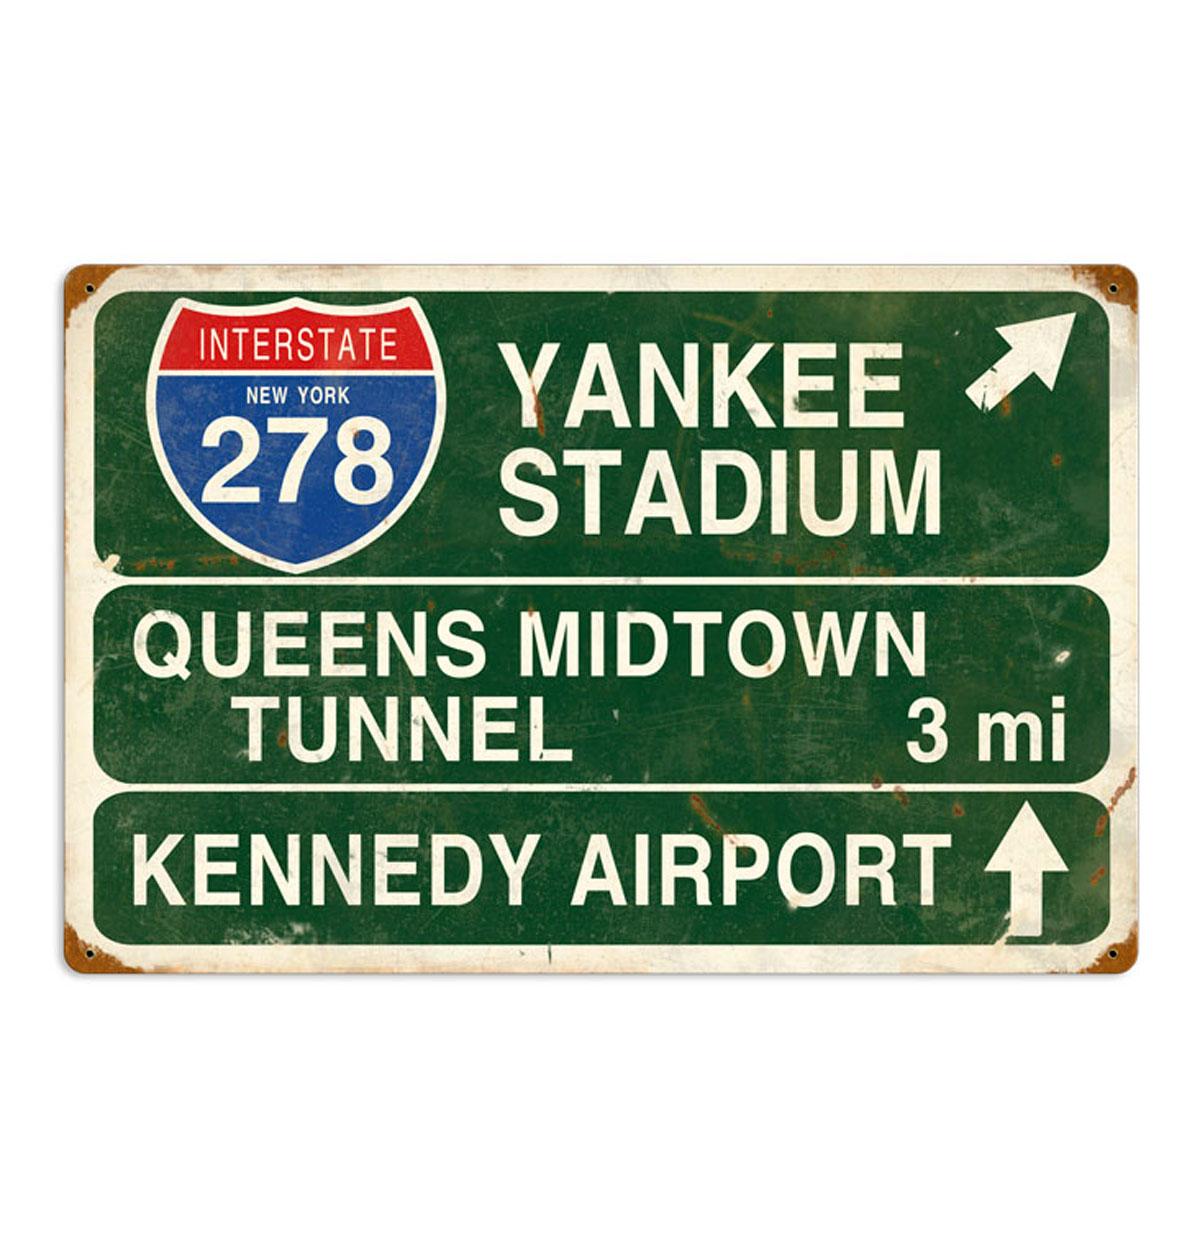 New York Yankee Stadium Interstate Zwaar Metalen Bord